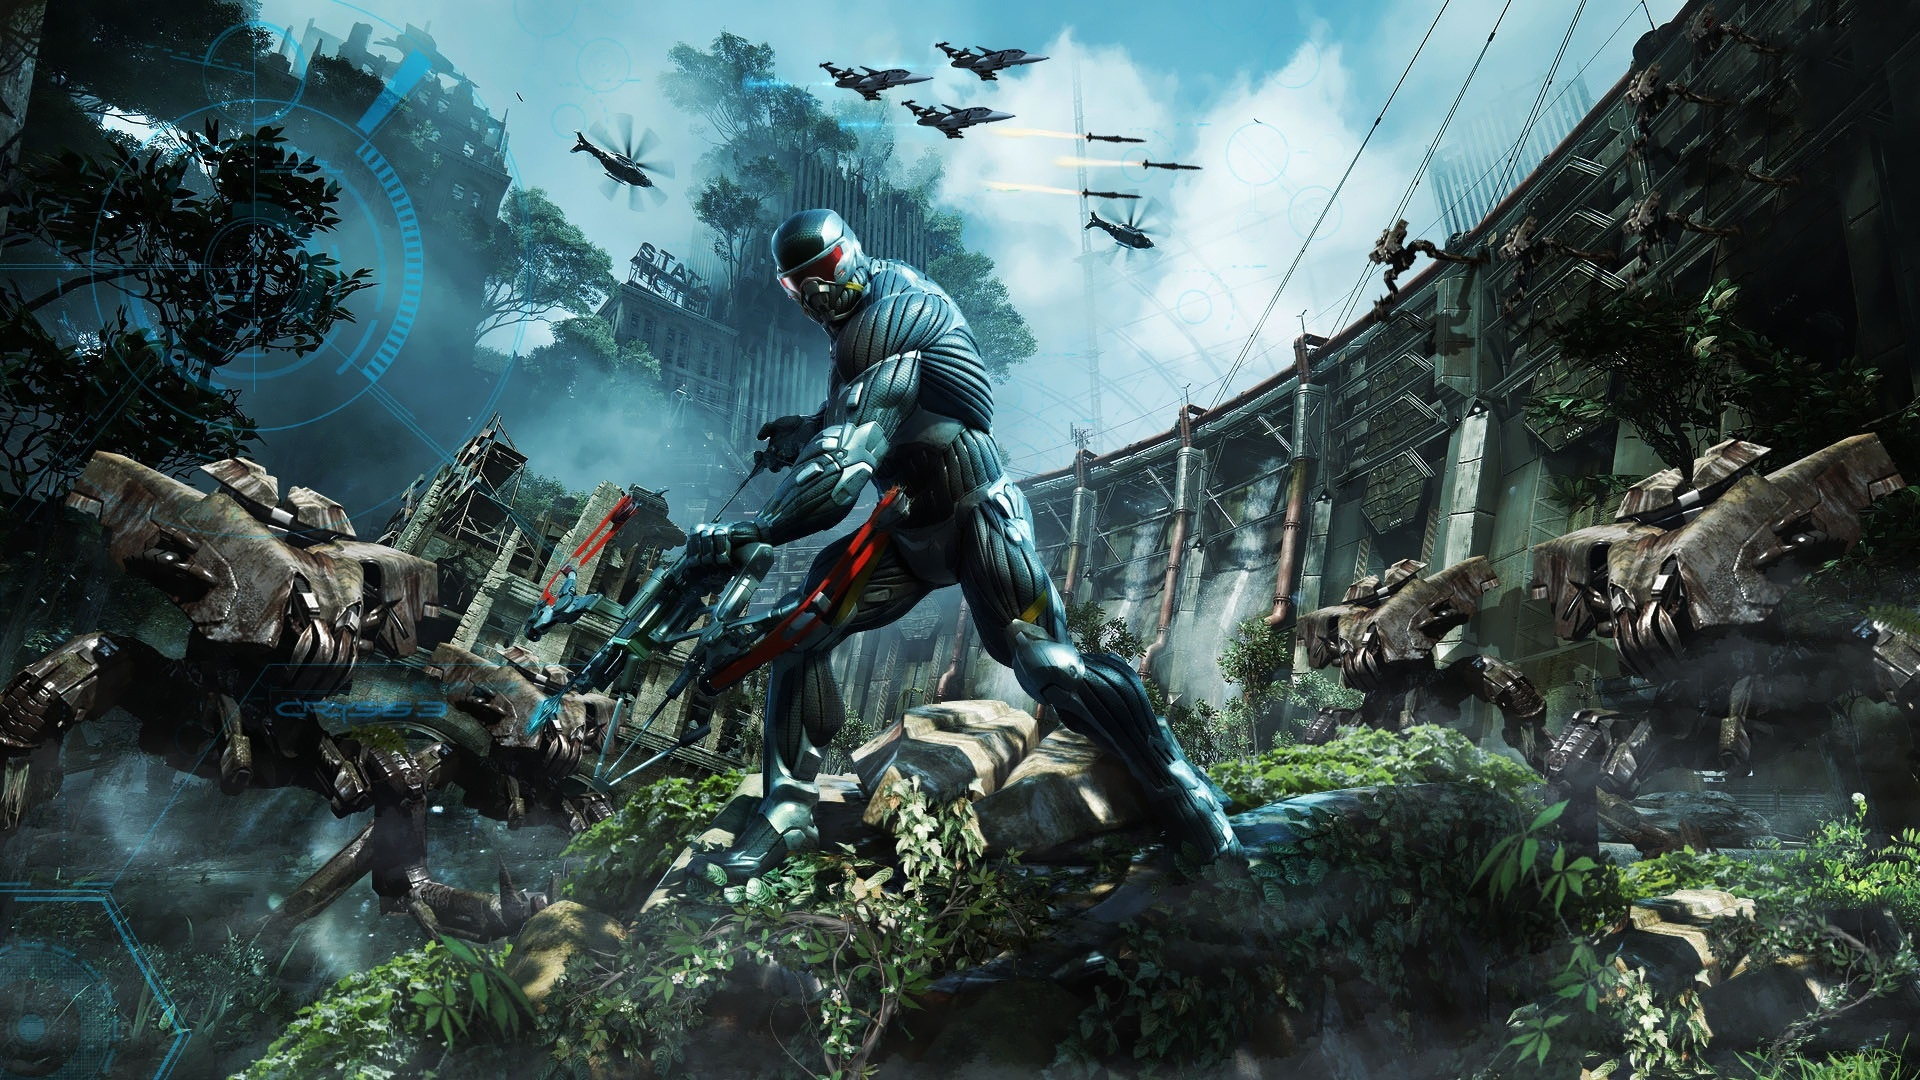 Fortnite Battle Royale Jeux Video Fond Ecran Fond Ecran Hd